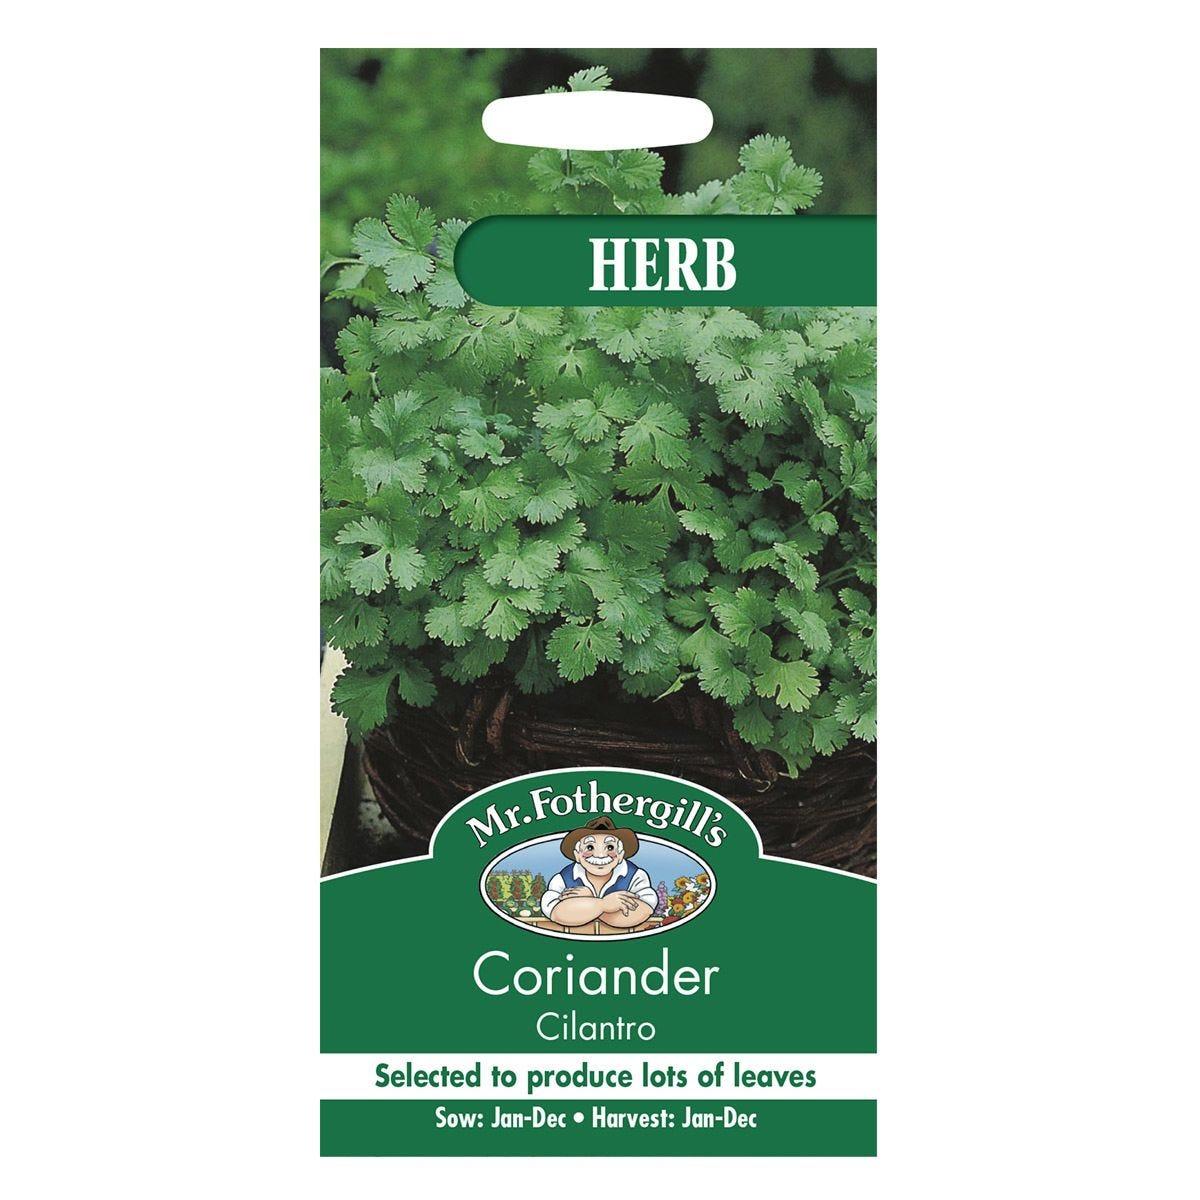 Mr Fothergill's Coriander Cilantro (For Leaf) Seeds